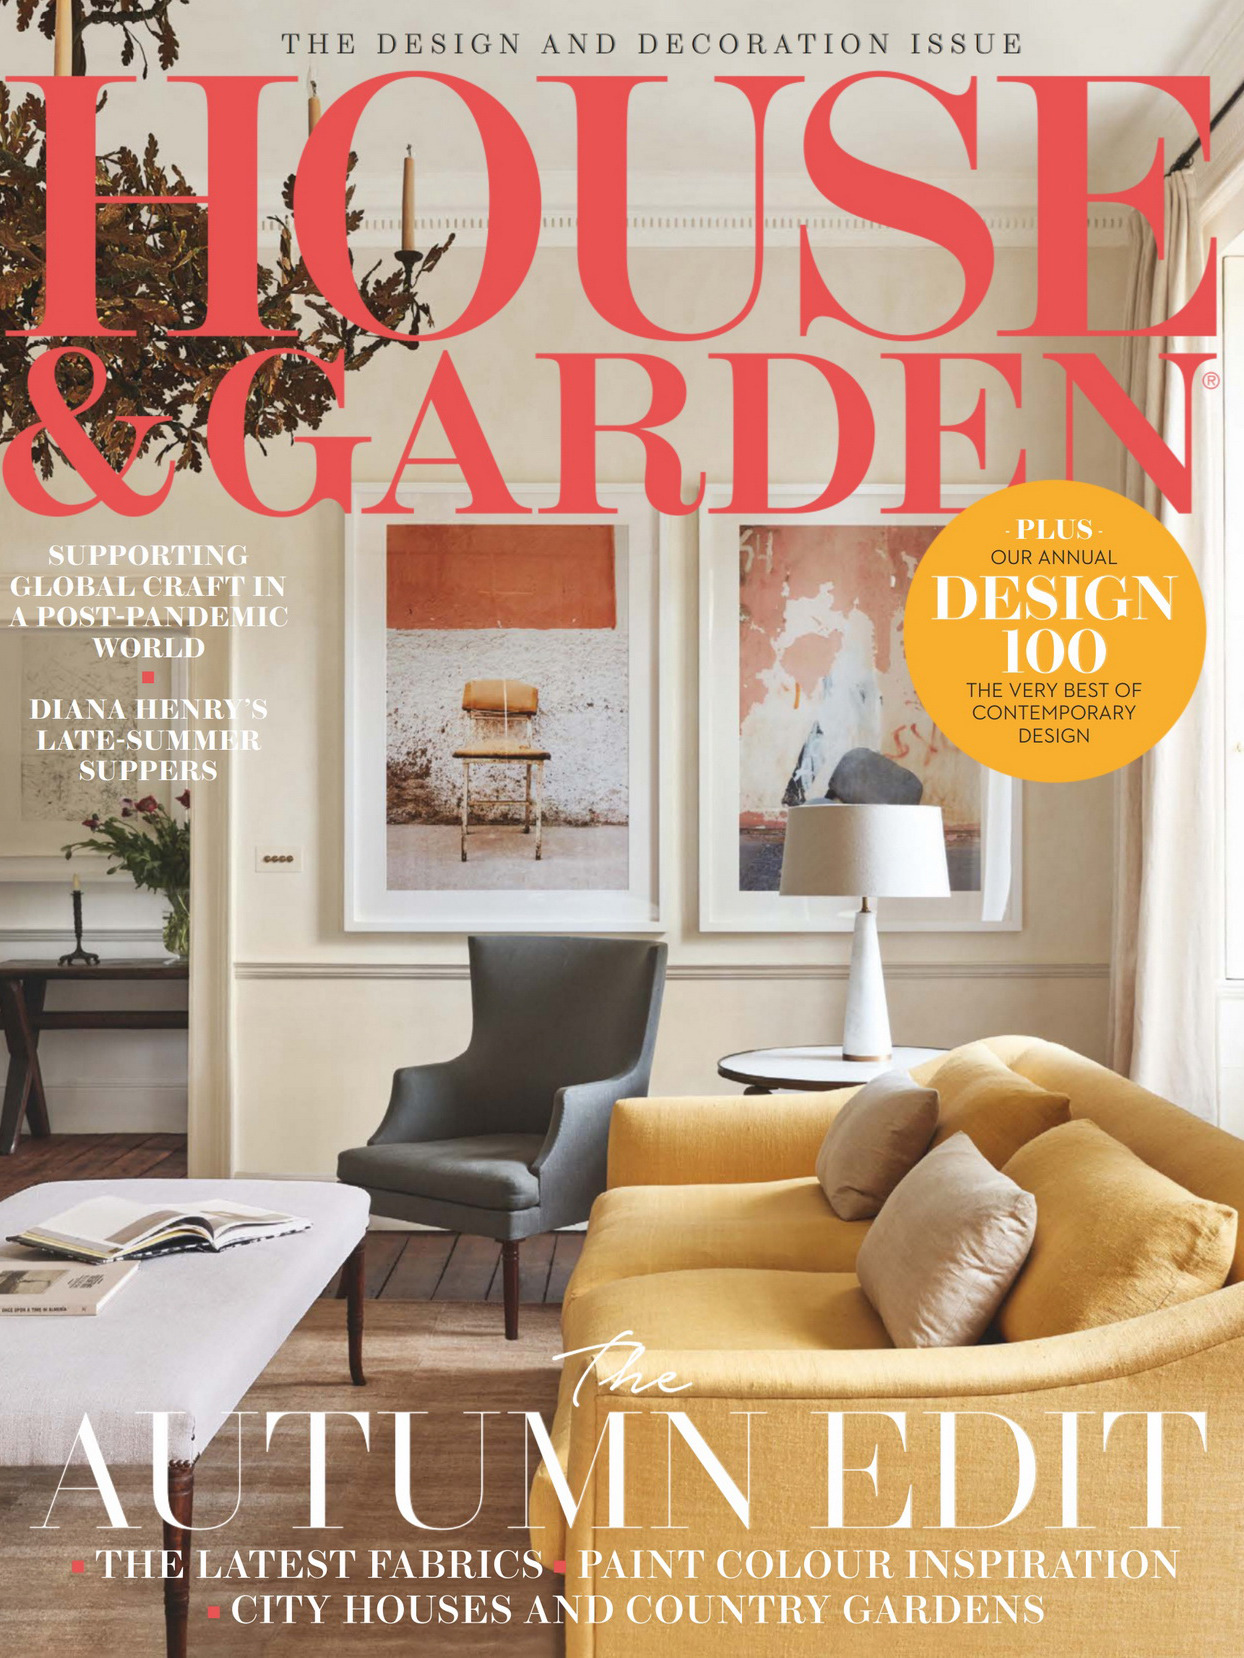 《House & Garden》英国版时尚家居杂志2020年10月号